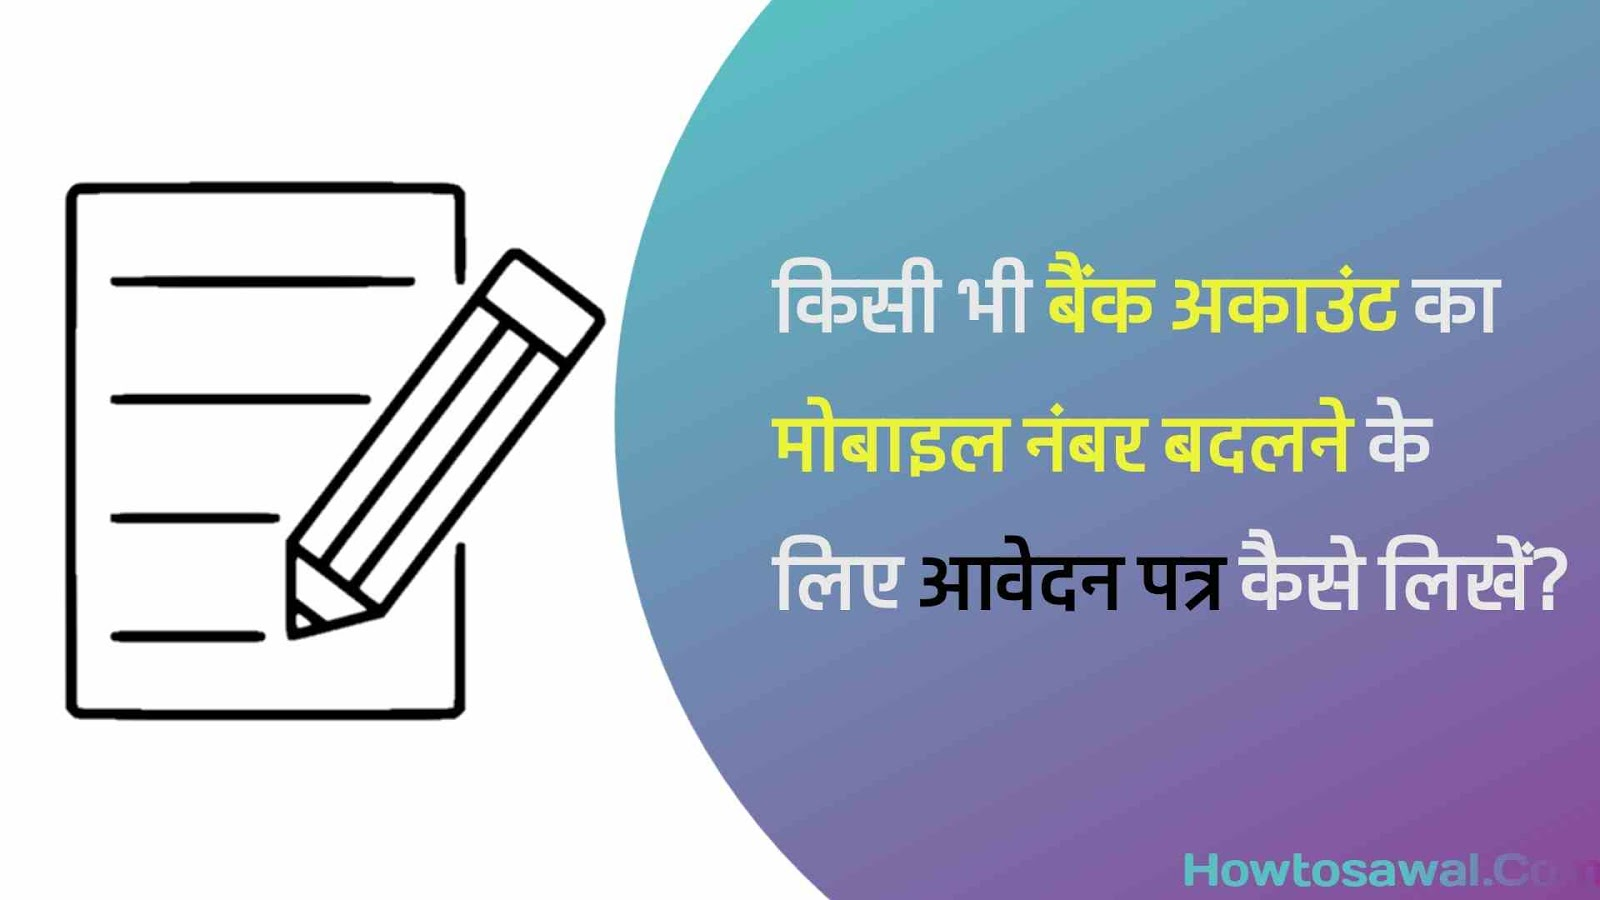 Bank Me mobile number dalne ke liye aawdan patra kaise likhen in Hindi